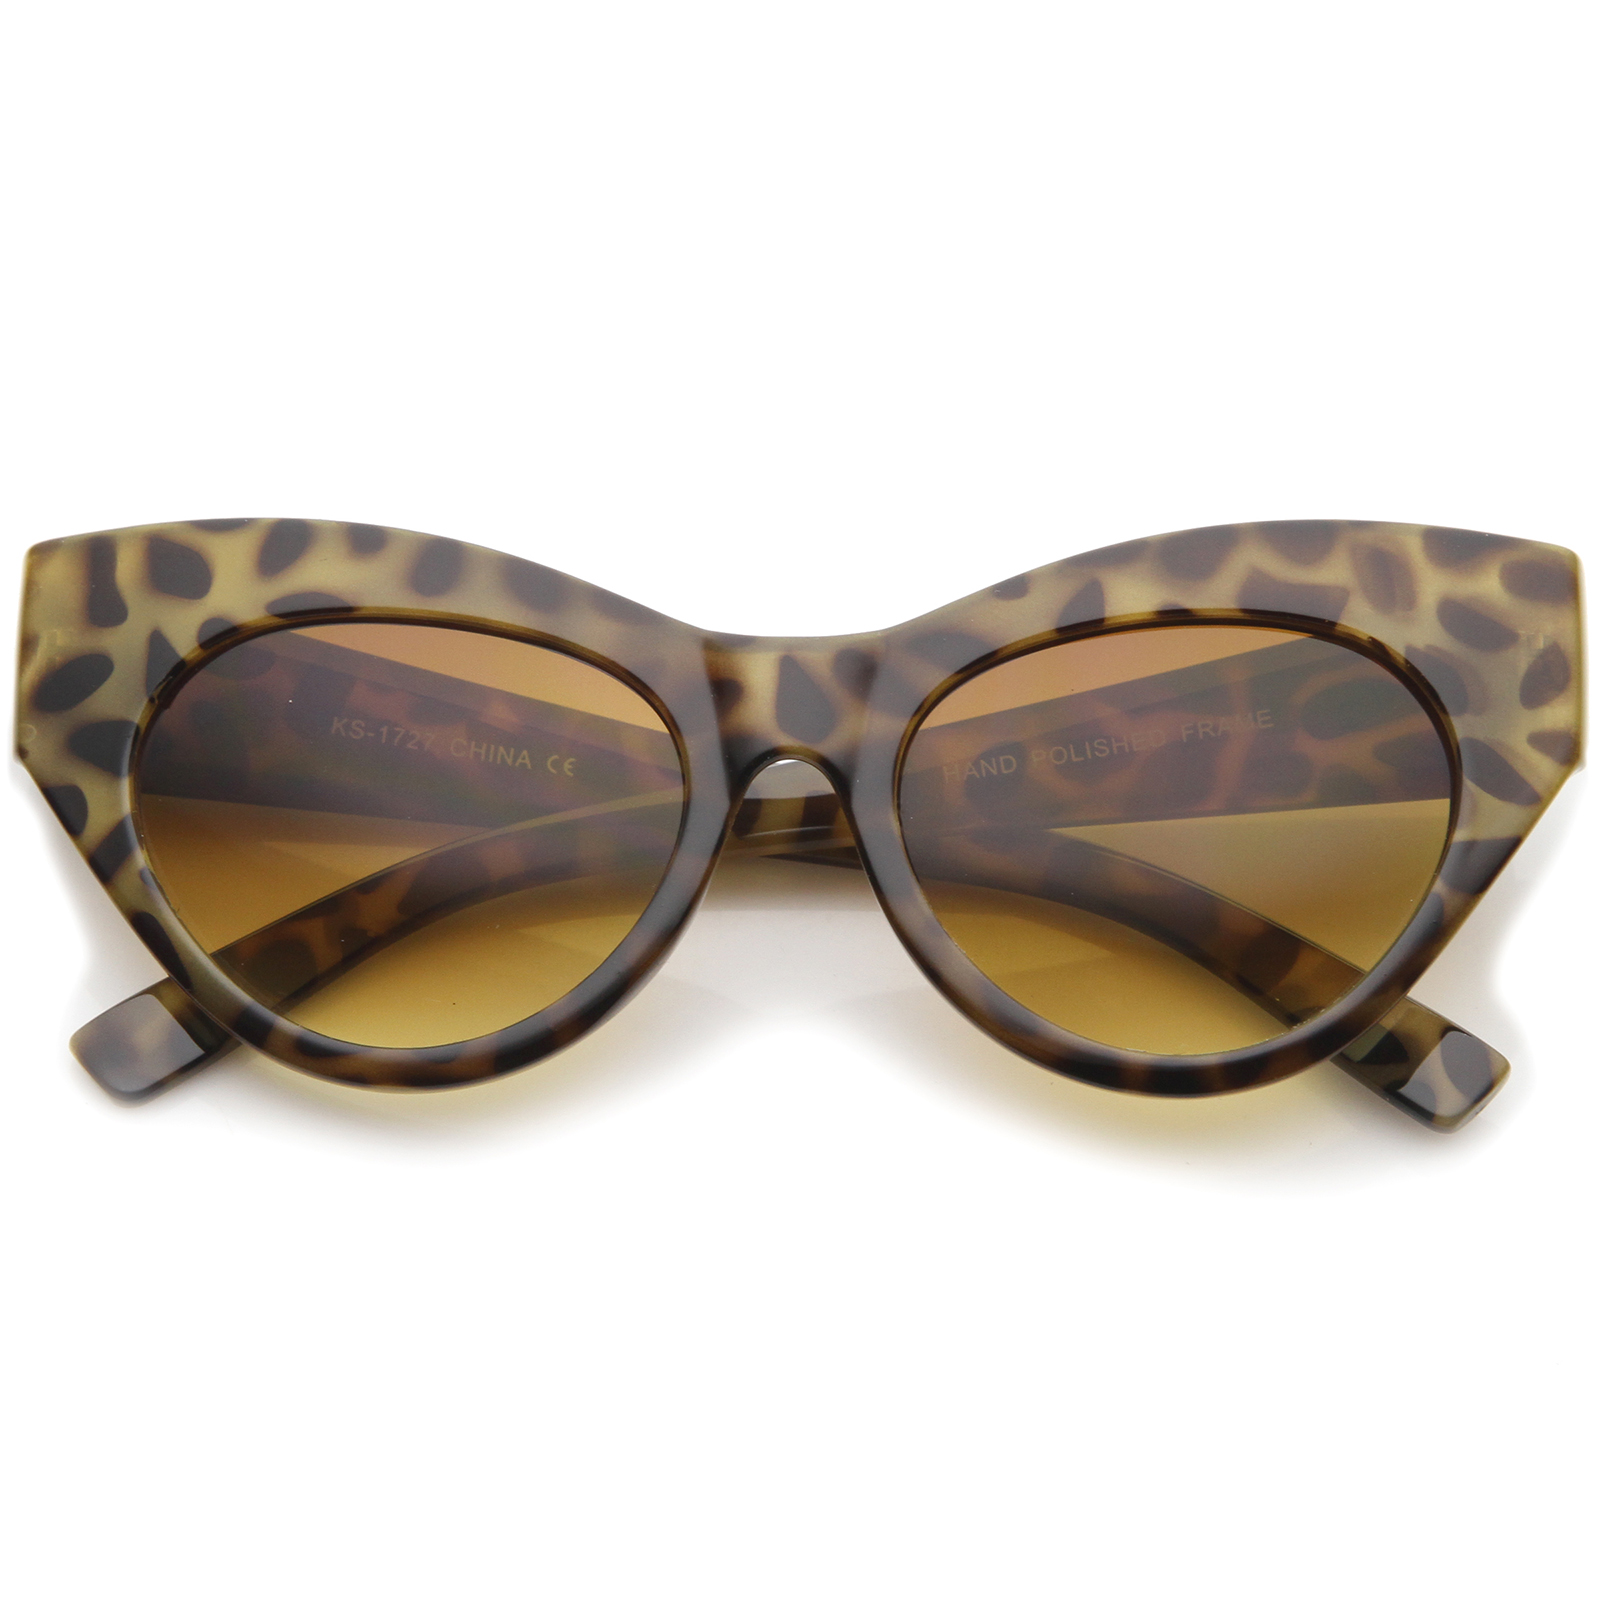 sunglassLA - Womens High Fashion Chunky Frame Oversize Bold Cat Eye Sunglasses - 57mm